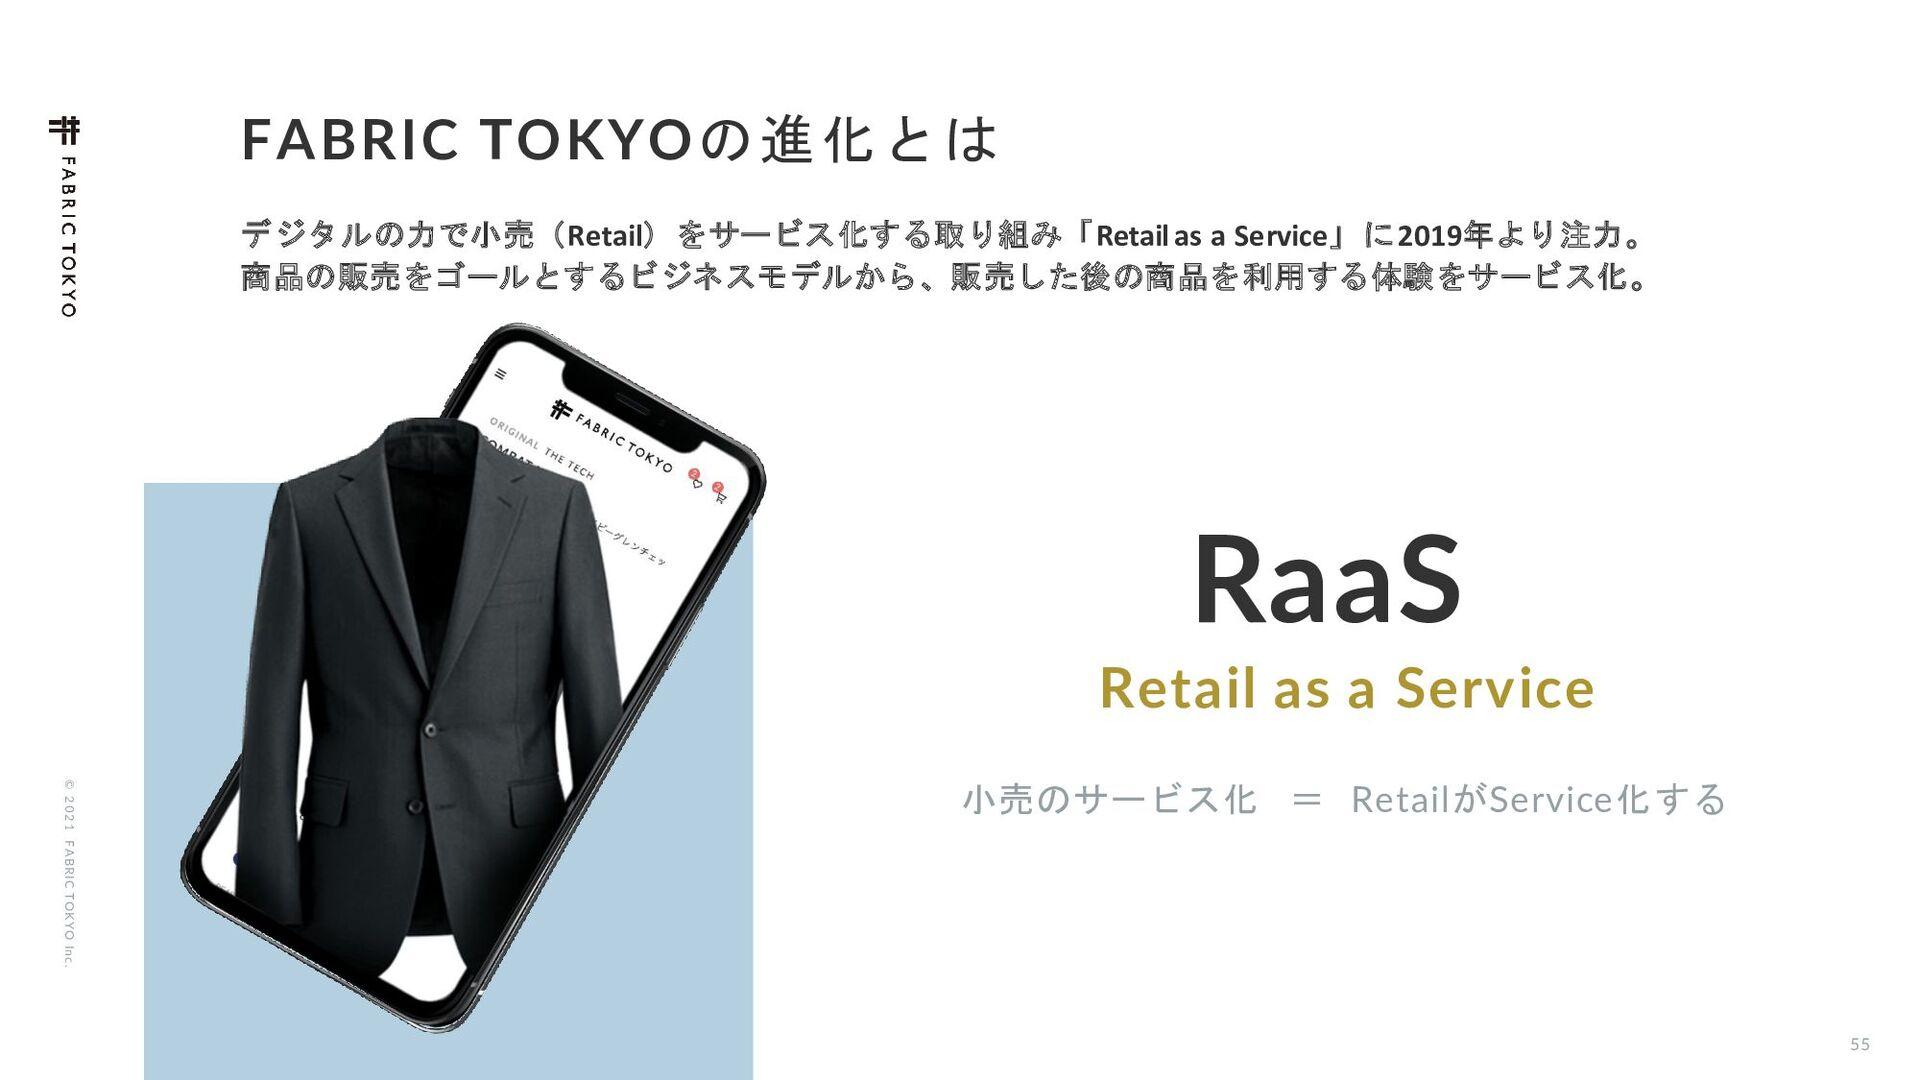 © 2021 FABRIC TOKYO Inc. 53 FABRIC TOKYO ΞύϨϧɾ...